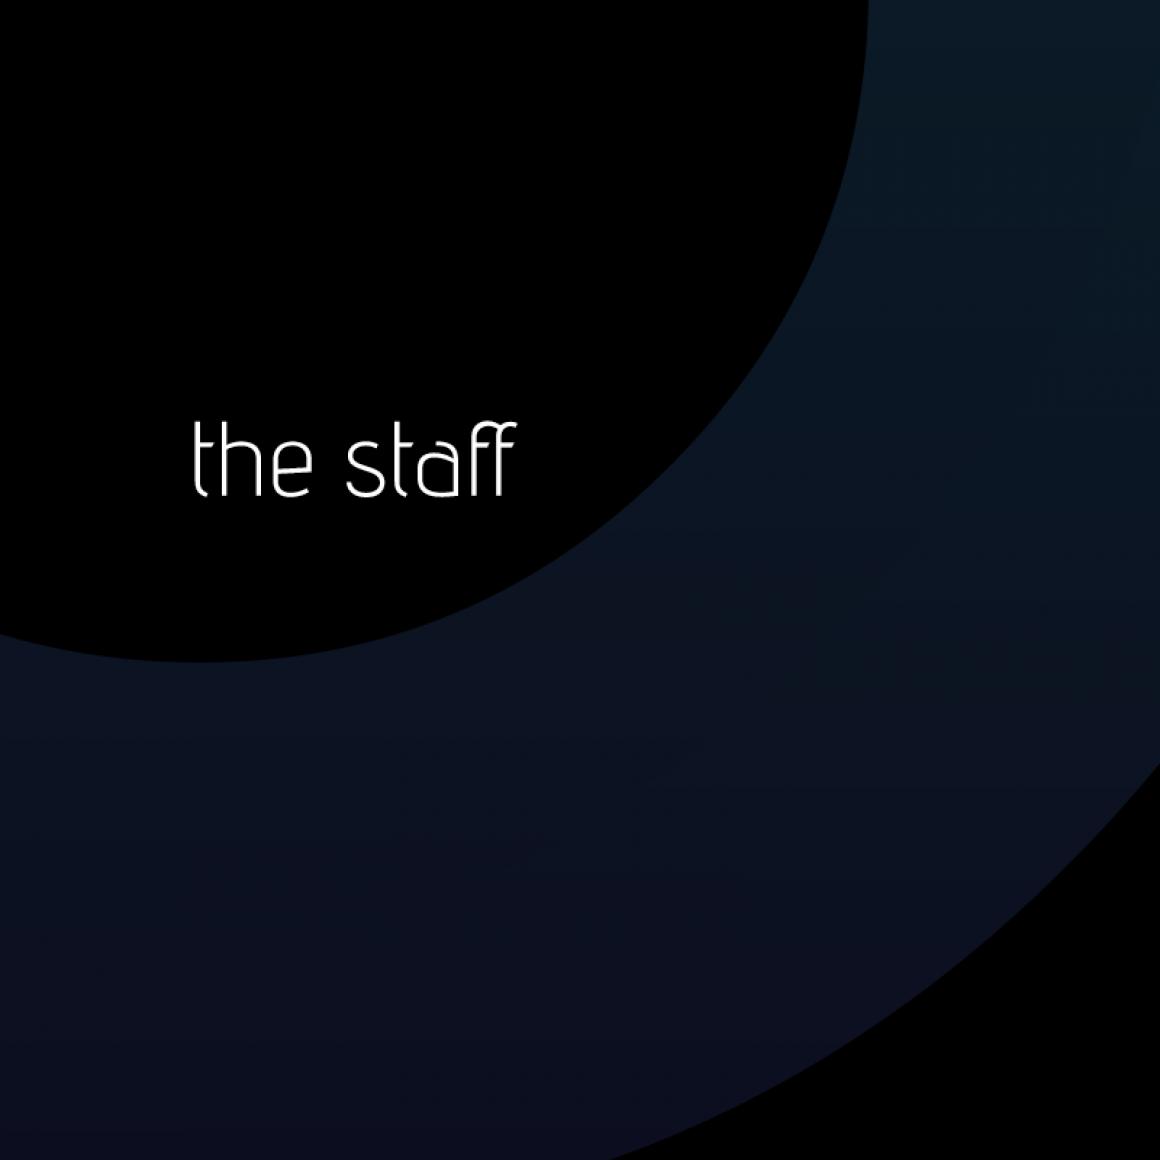 theStaff_06